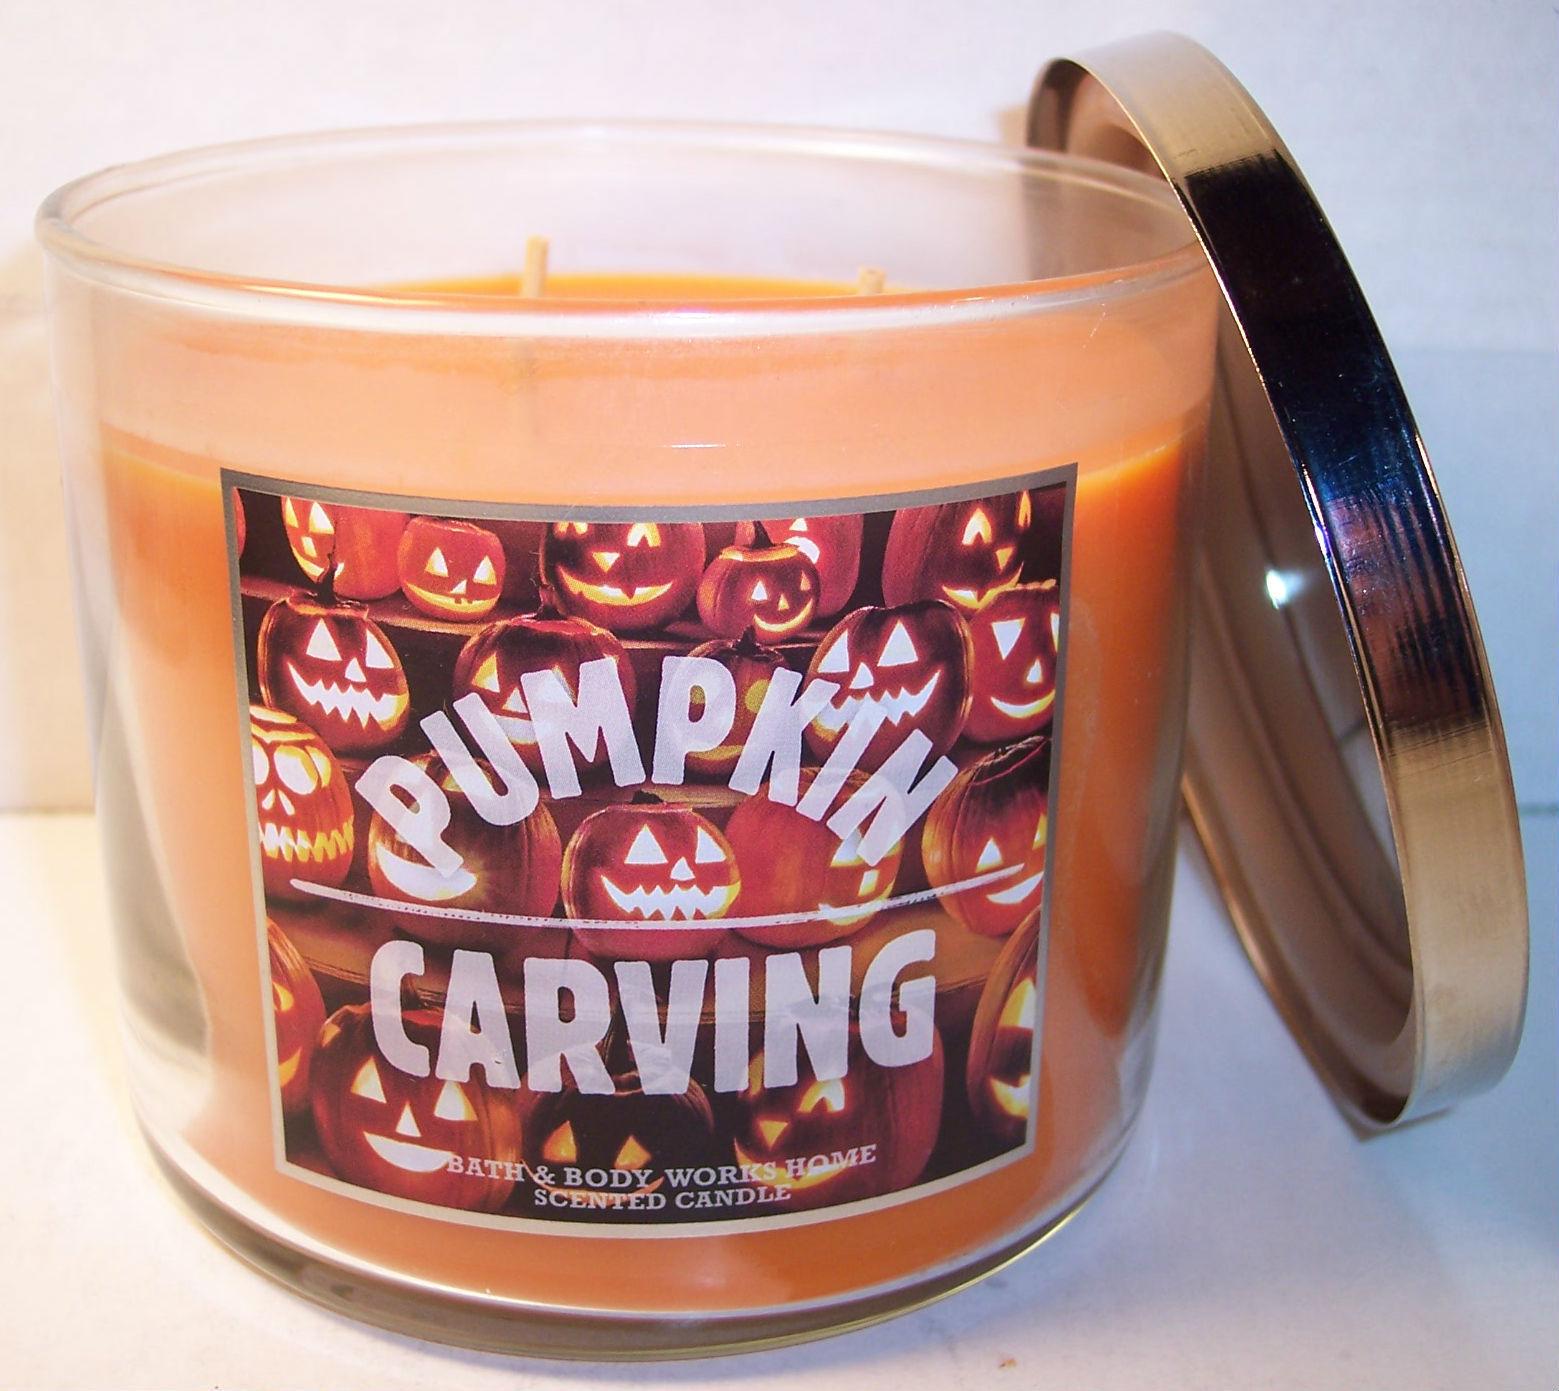 Bath & Body Works 3 wick 14.5 oz Candle jack-o-lanterns  Pumpkin Carving